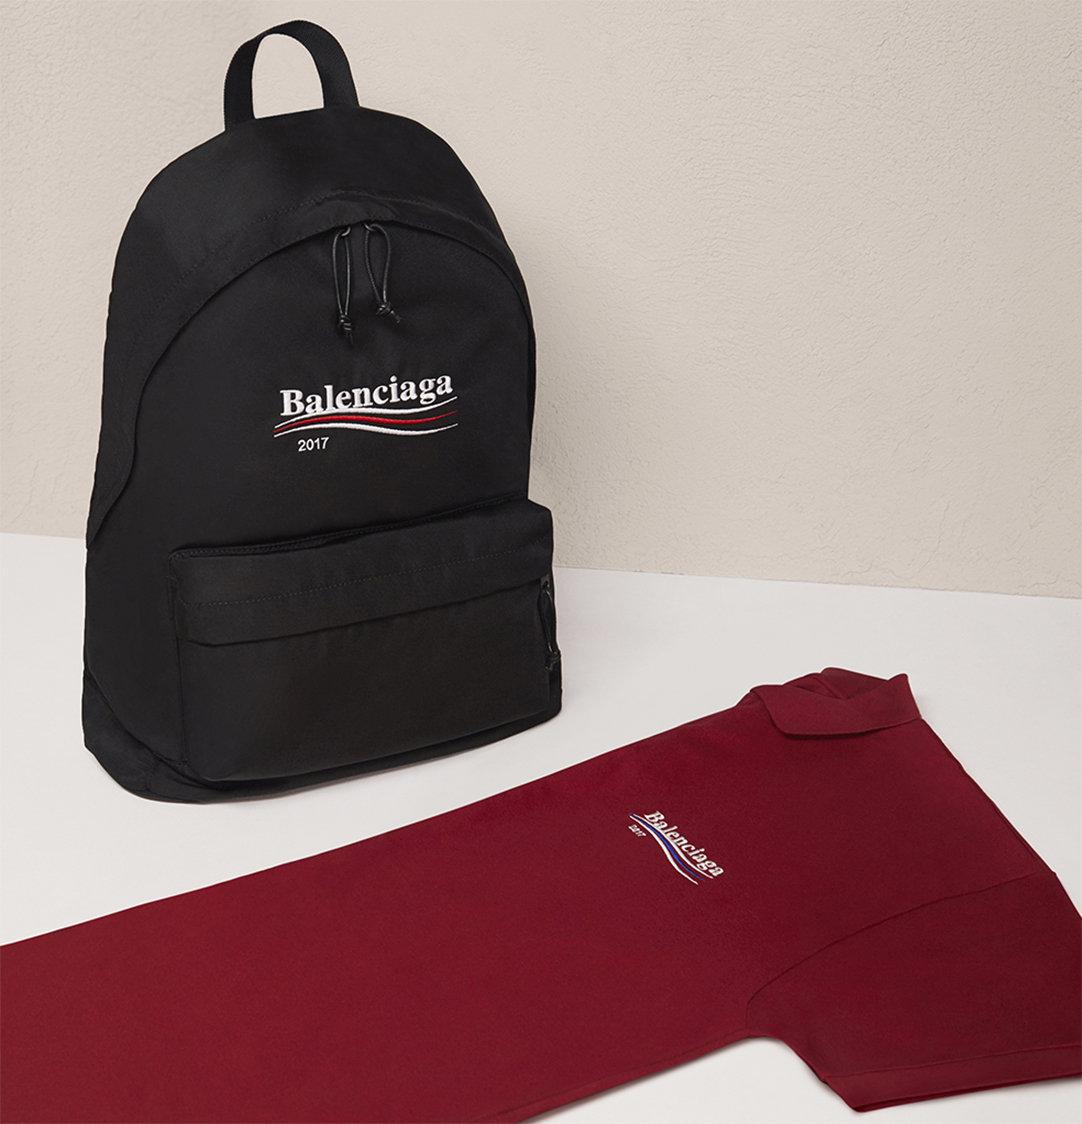 timeless design 4f1ac b270e Balenciaga - Bernie Sanders logo backpack and polo shirt